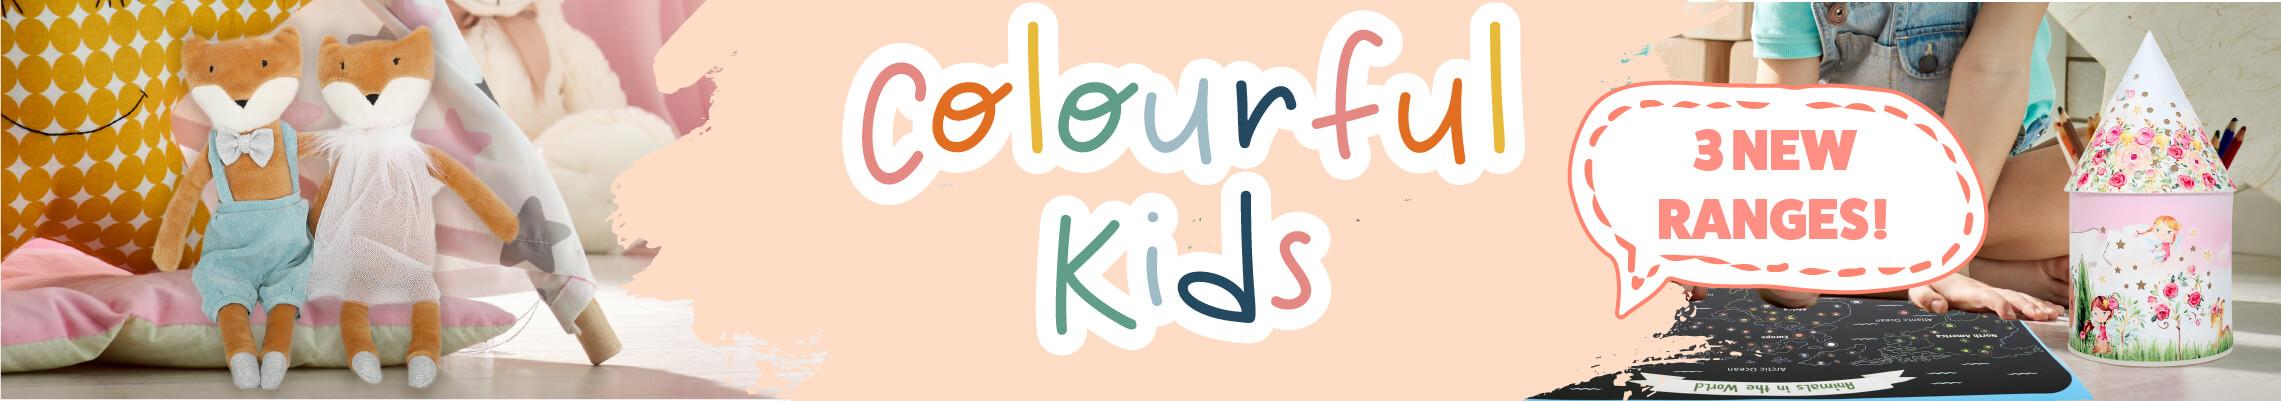 Colourful Kids Plush Toys